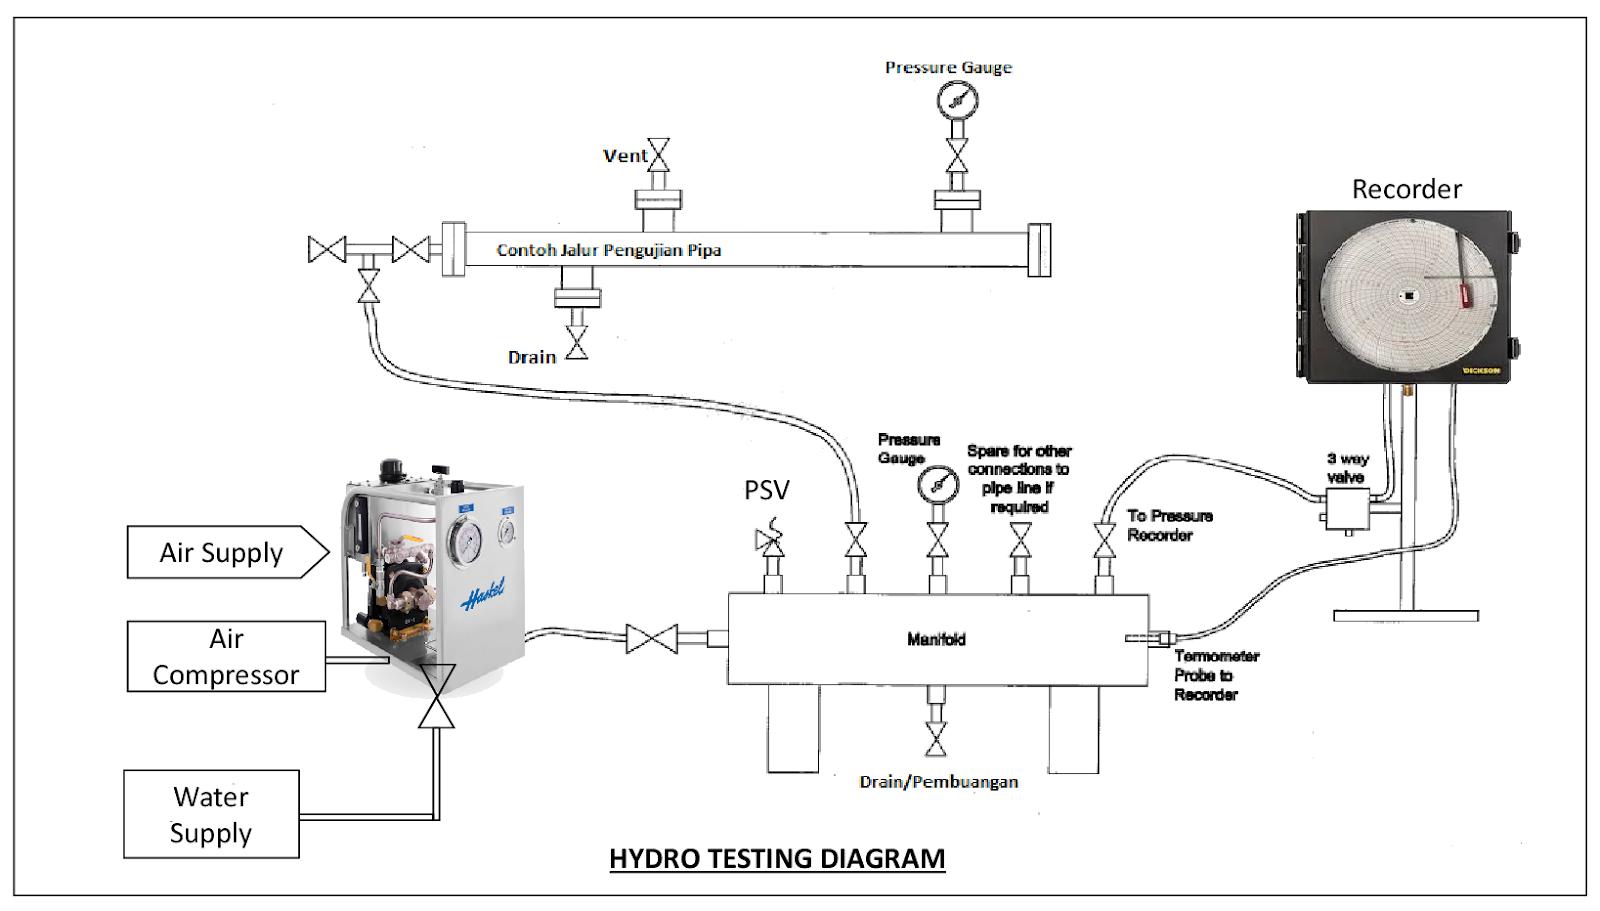 Proses Hydro Testing Pada Sistem Pipa